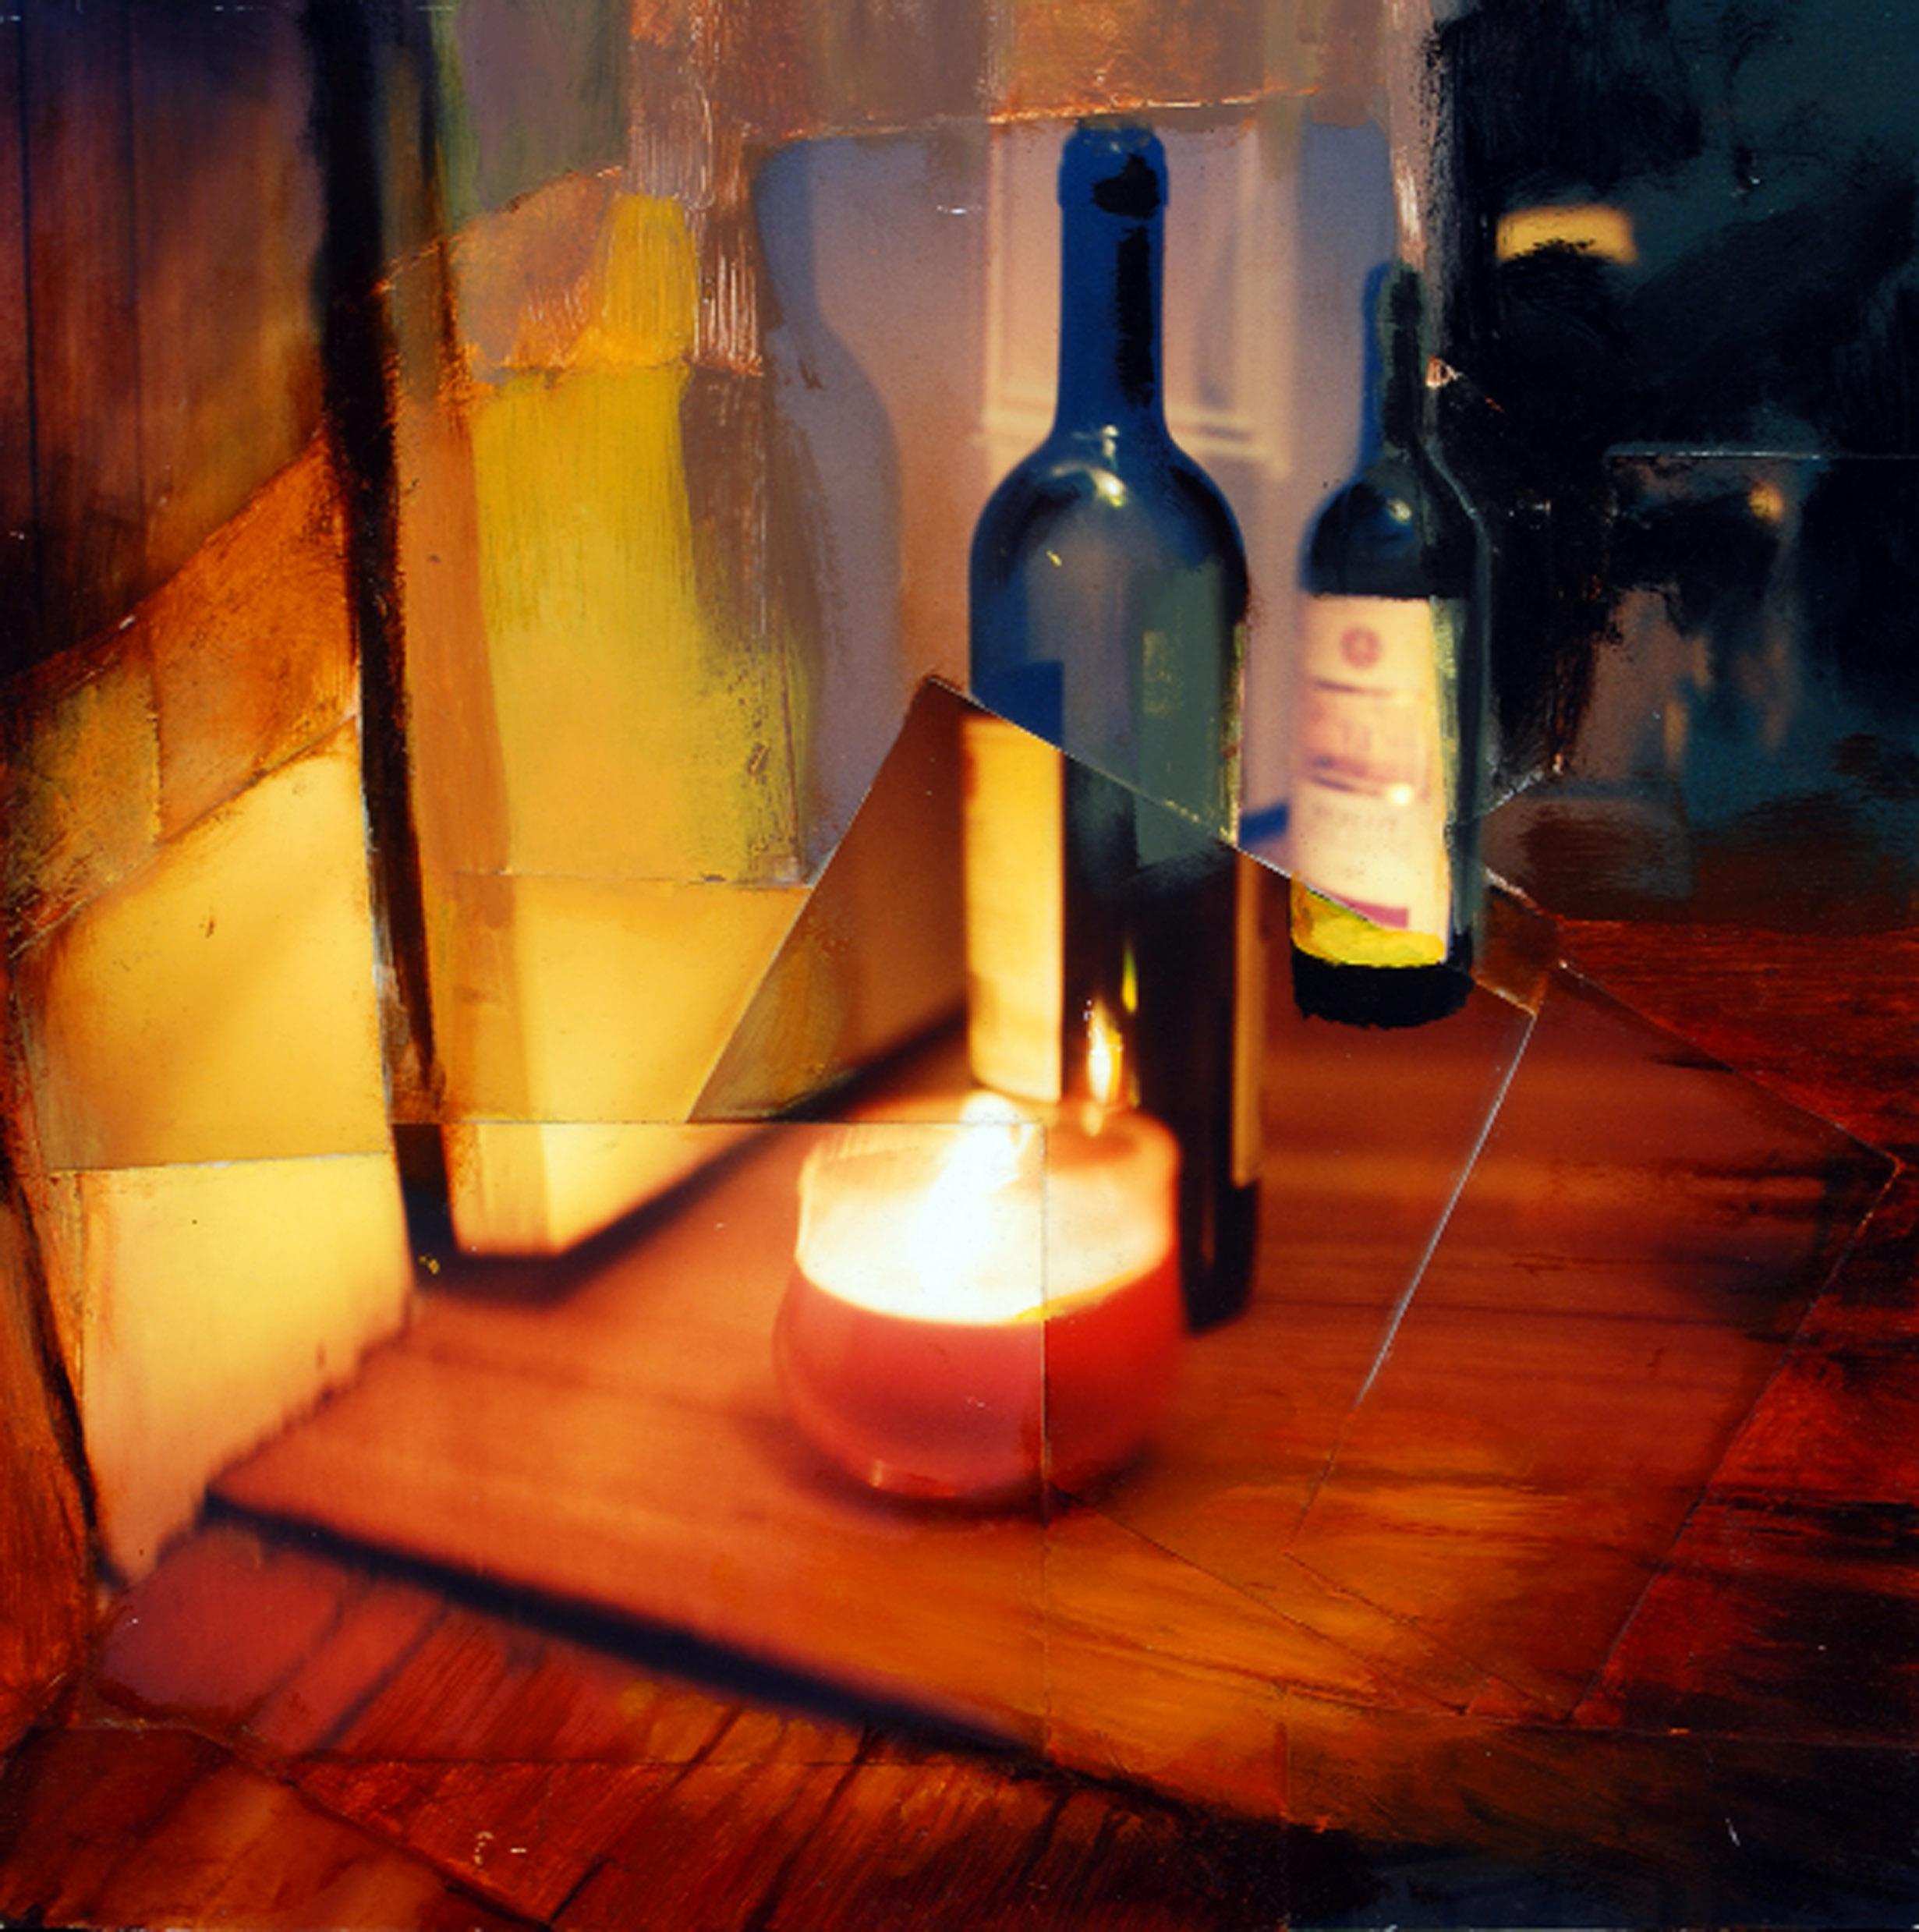 Wine bottle still #2 .jpg